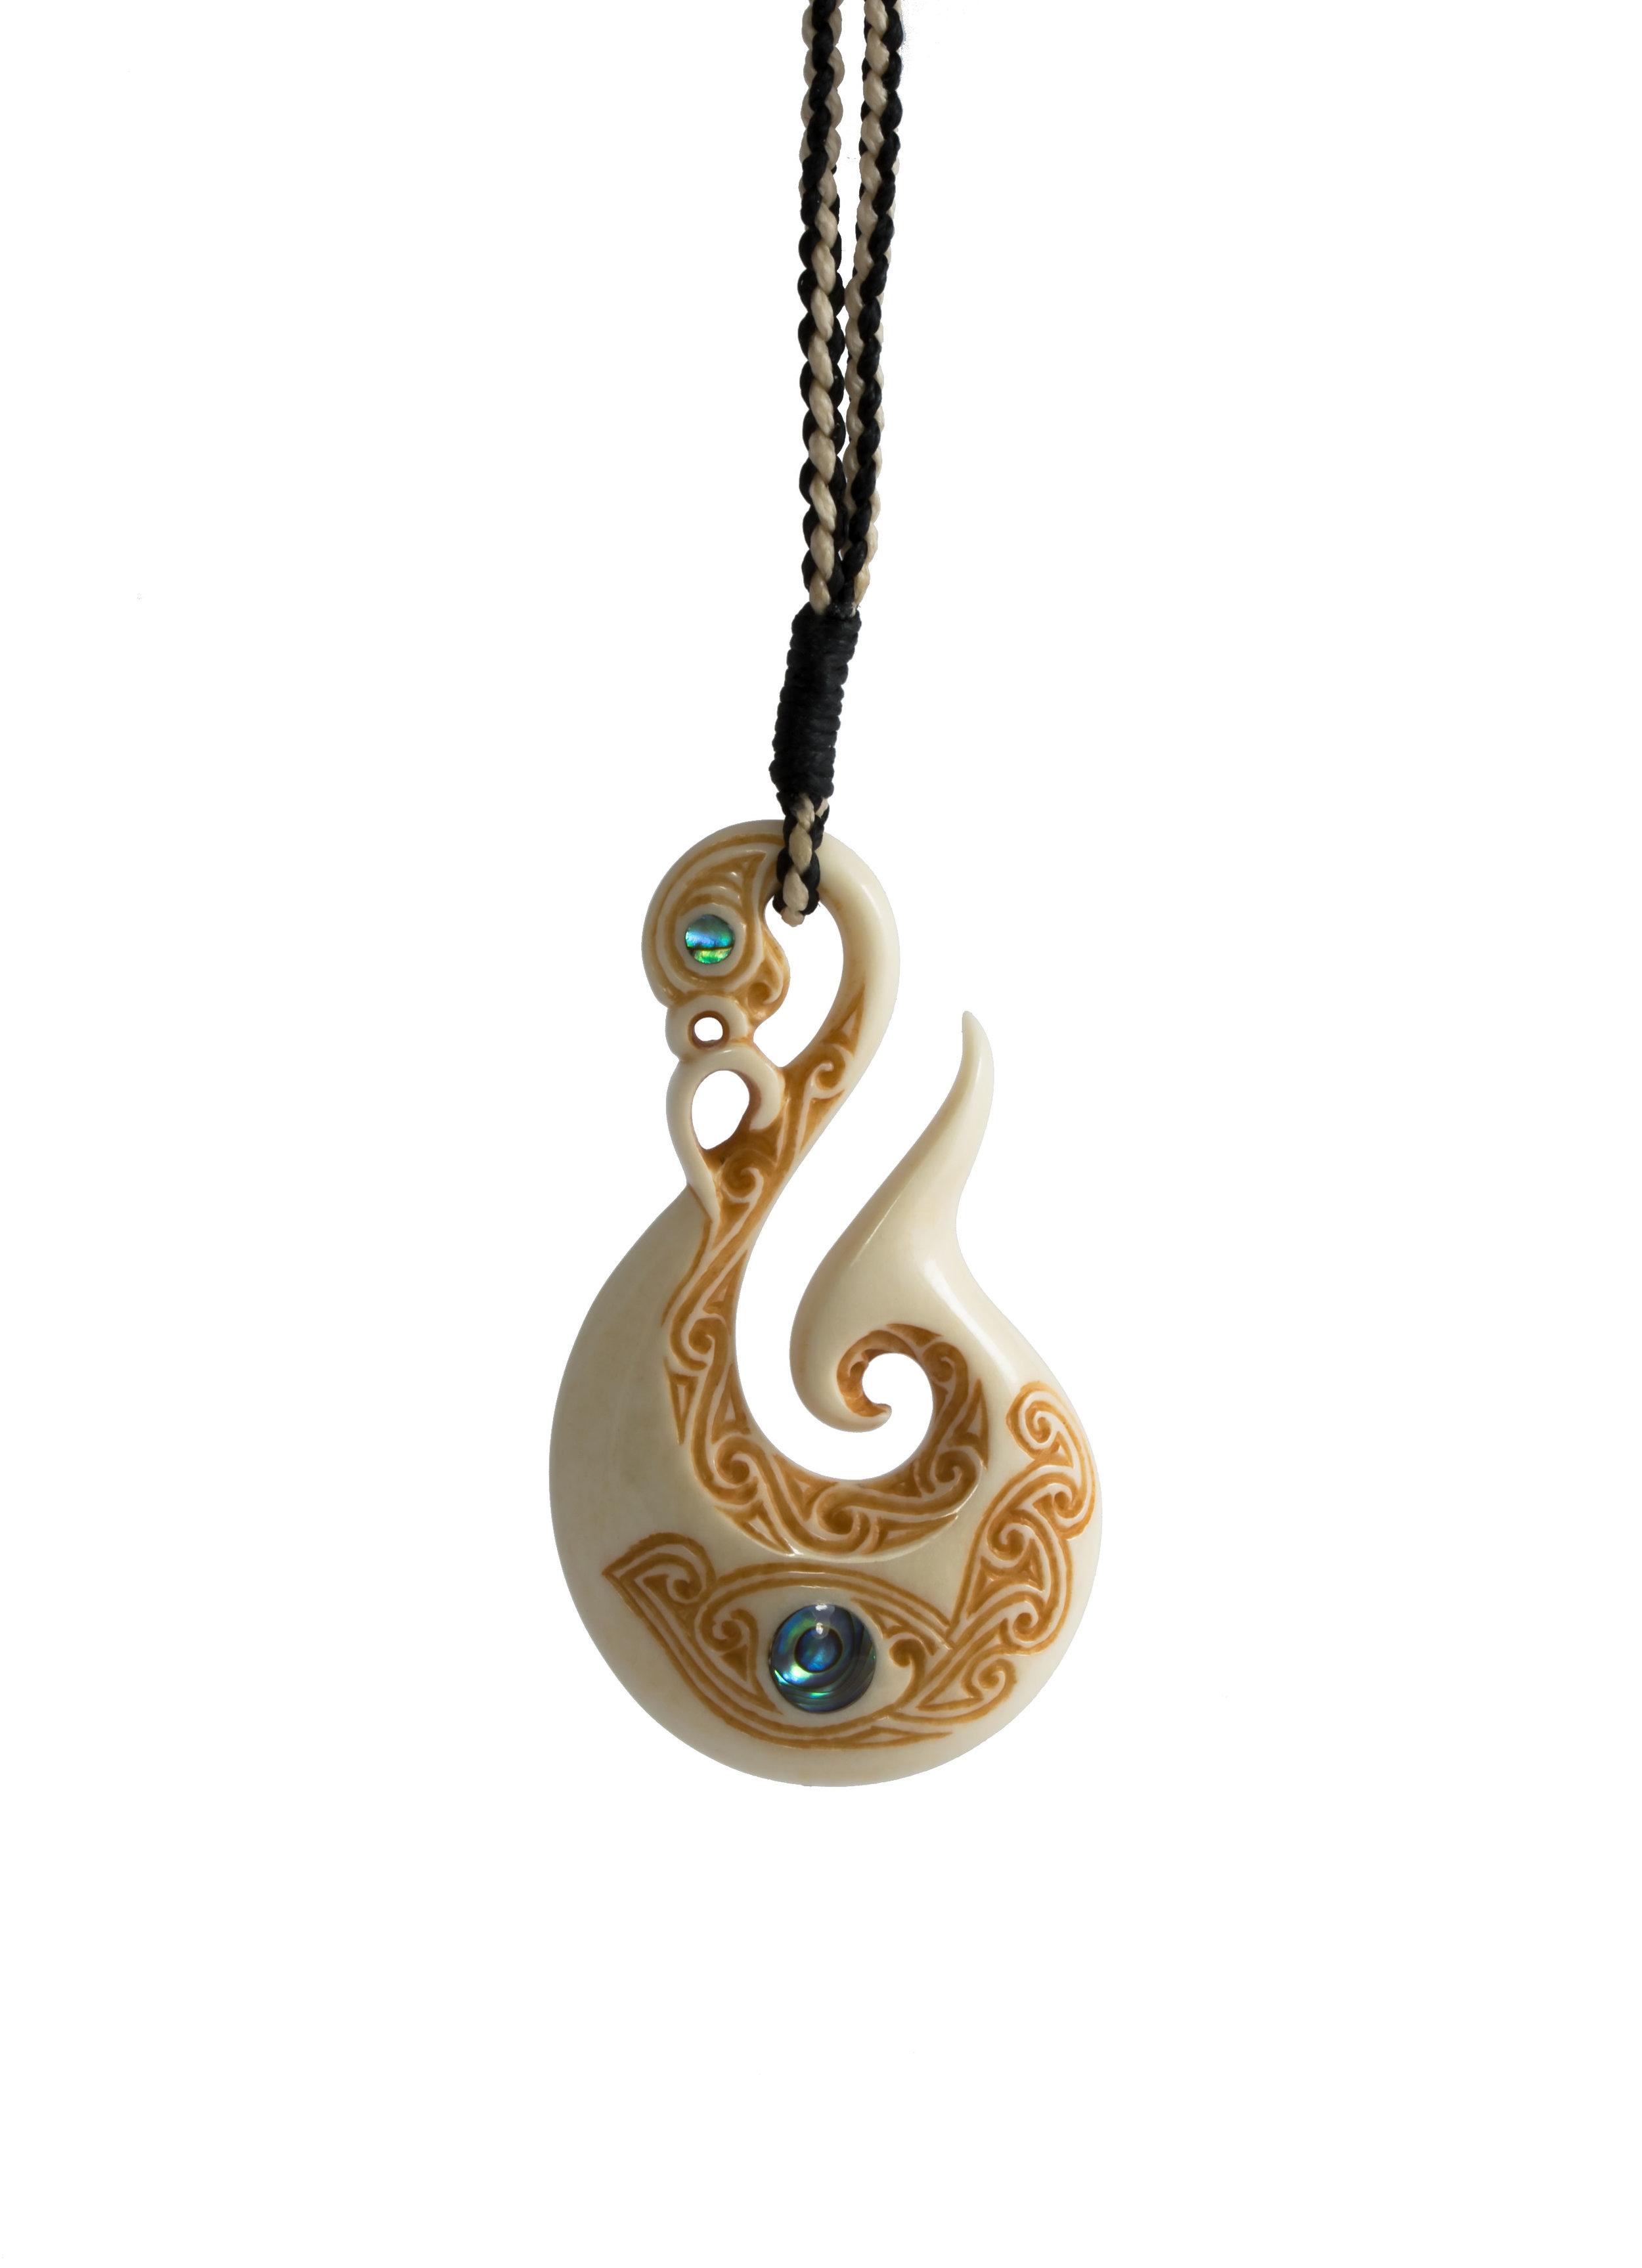 Manaia Hook - Kanohi Atua - Divine Eye.jpg